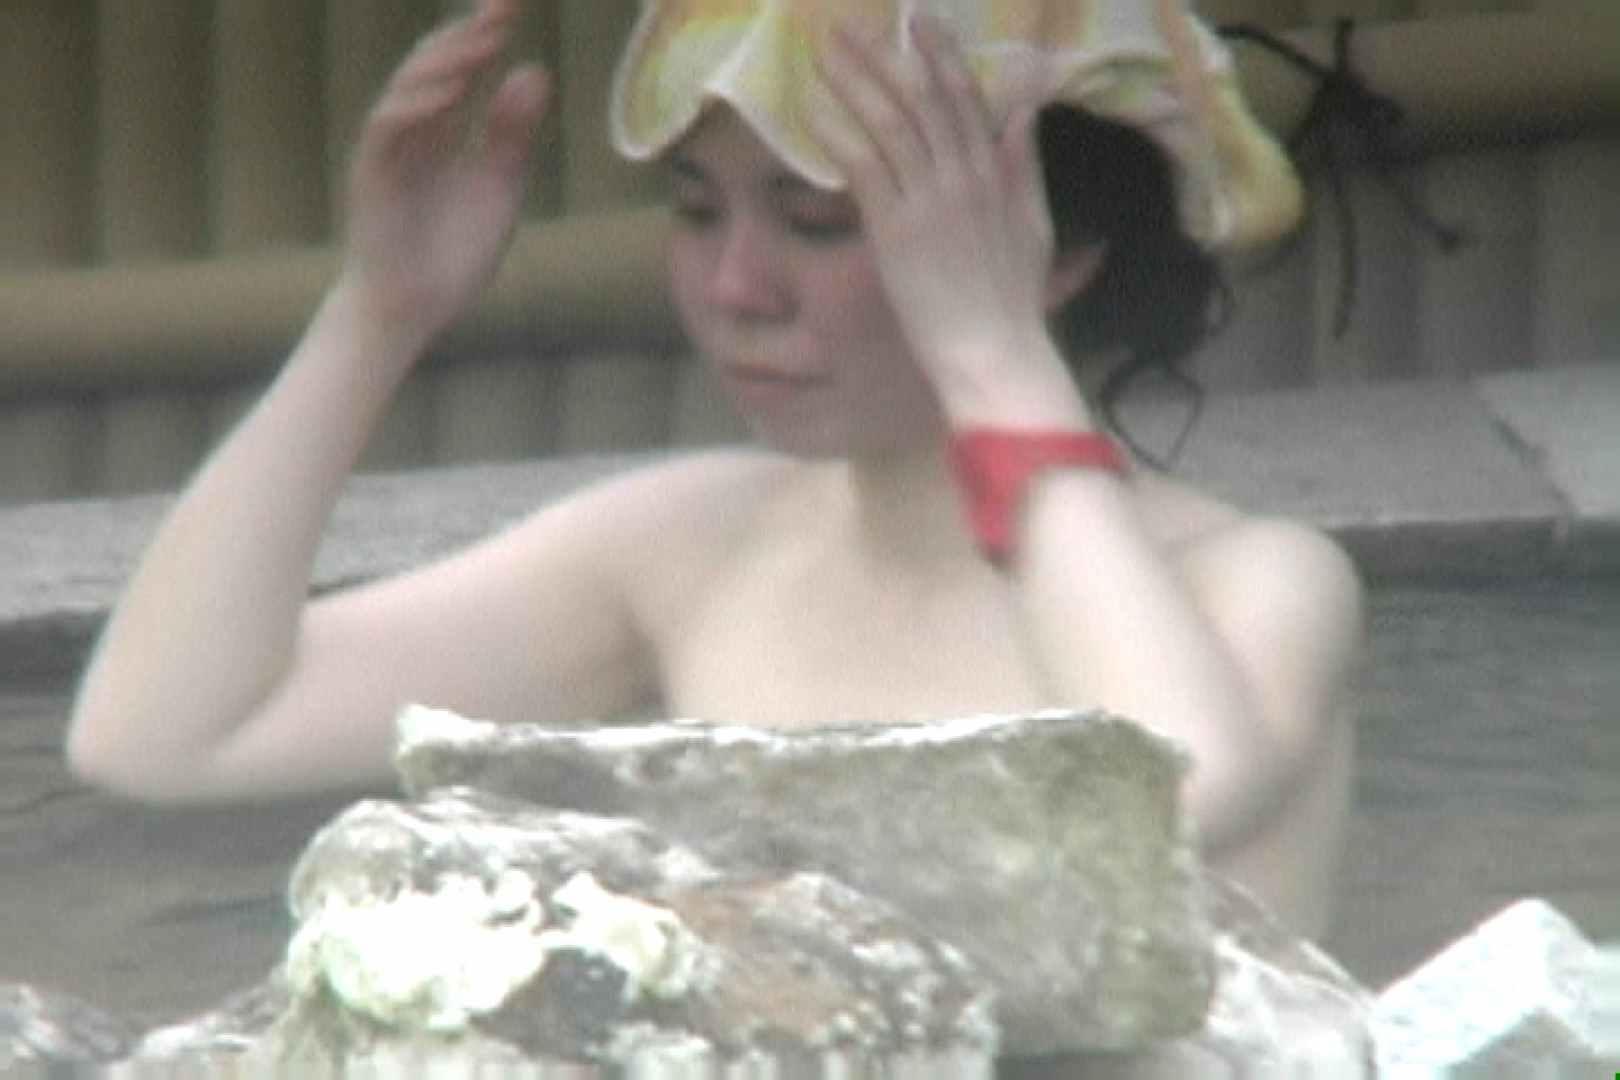 Aquaな露天風呂Vol.687 盗撮   OLセックス  63画像 16